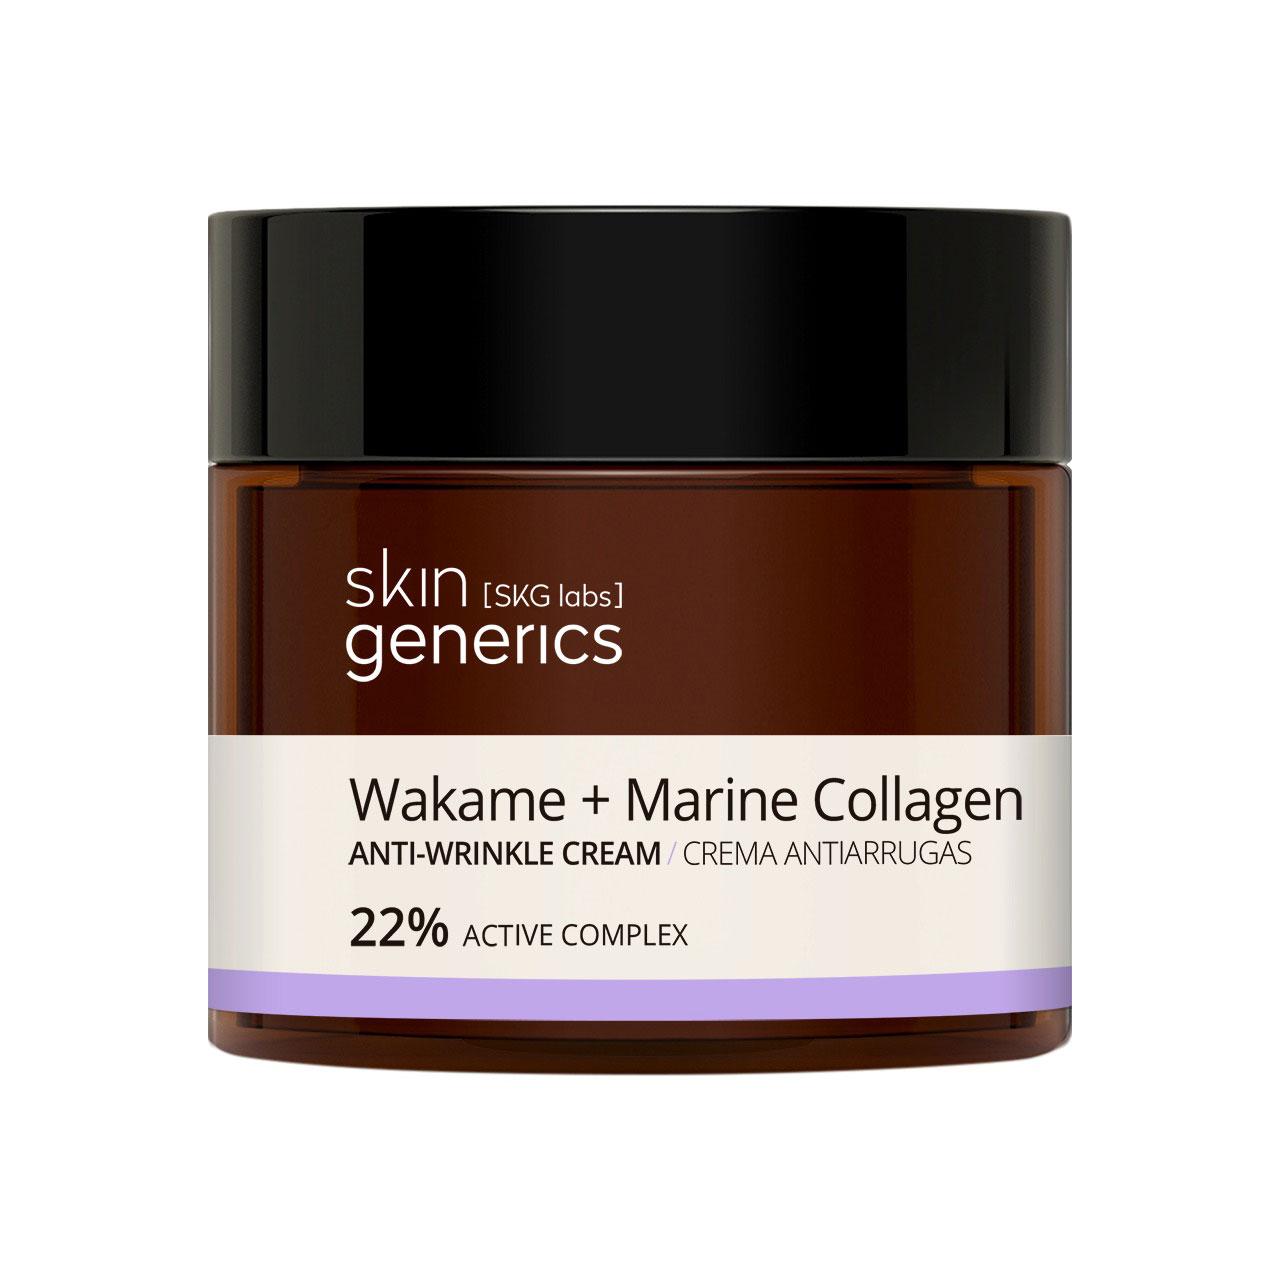 ANTI-WRINKLE CREAM WAKAME 23% ACTIVE COMPLEX